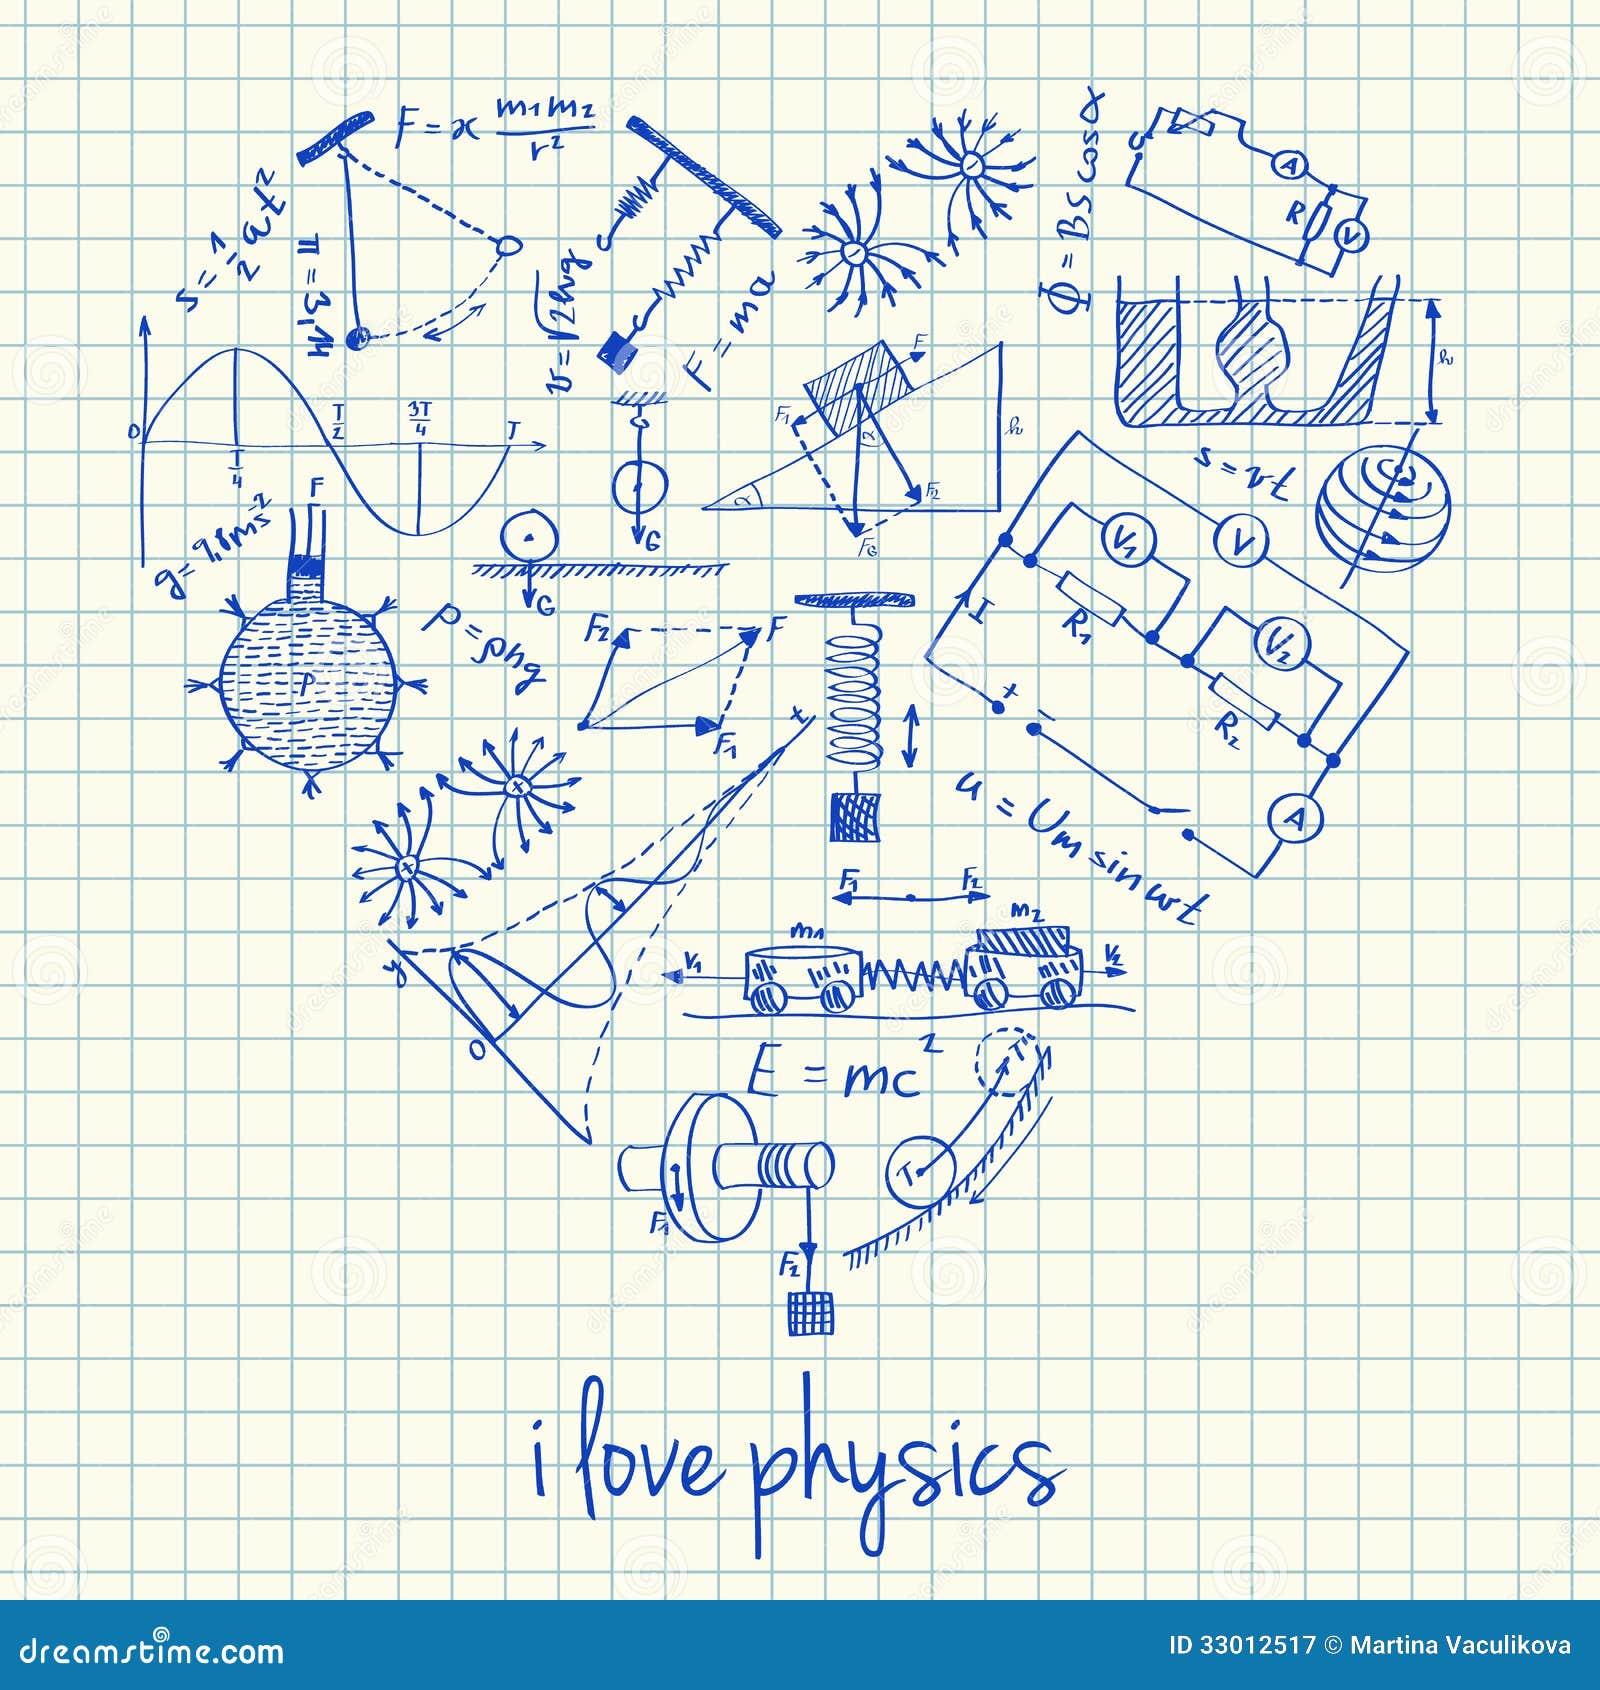 physics of the heart 1 the physics of the human body companion manual physics 3110 autumn semester 2002 richard j ingebretsen, md, phd.